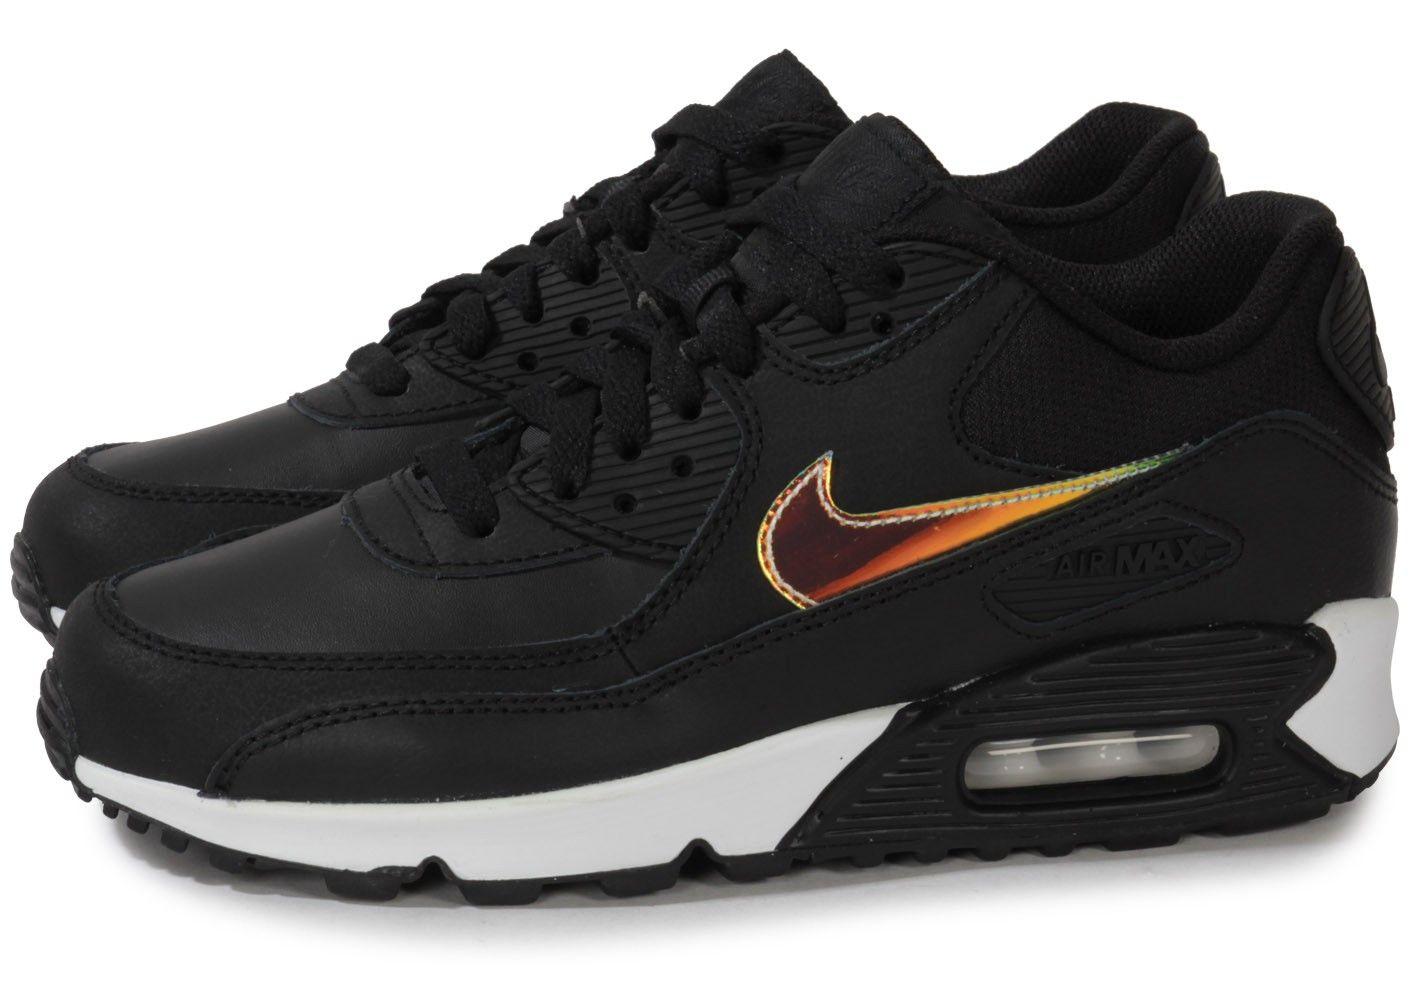 Chaussures Nike AIR MAX 90 NOIR IRIDESCENT JUNIOR vue